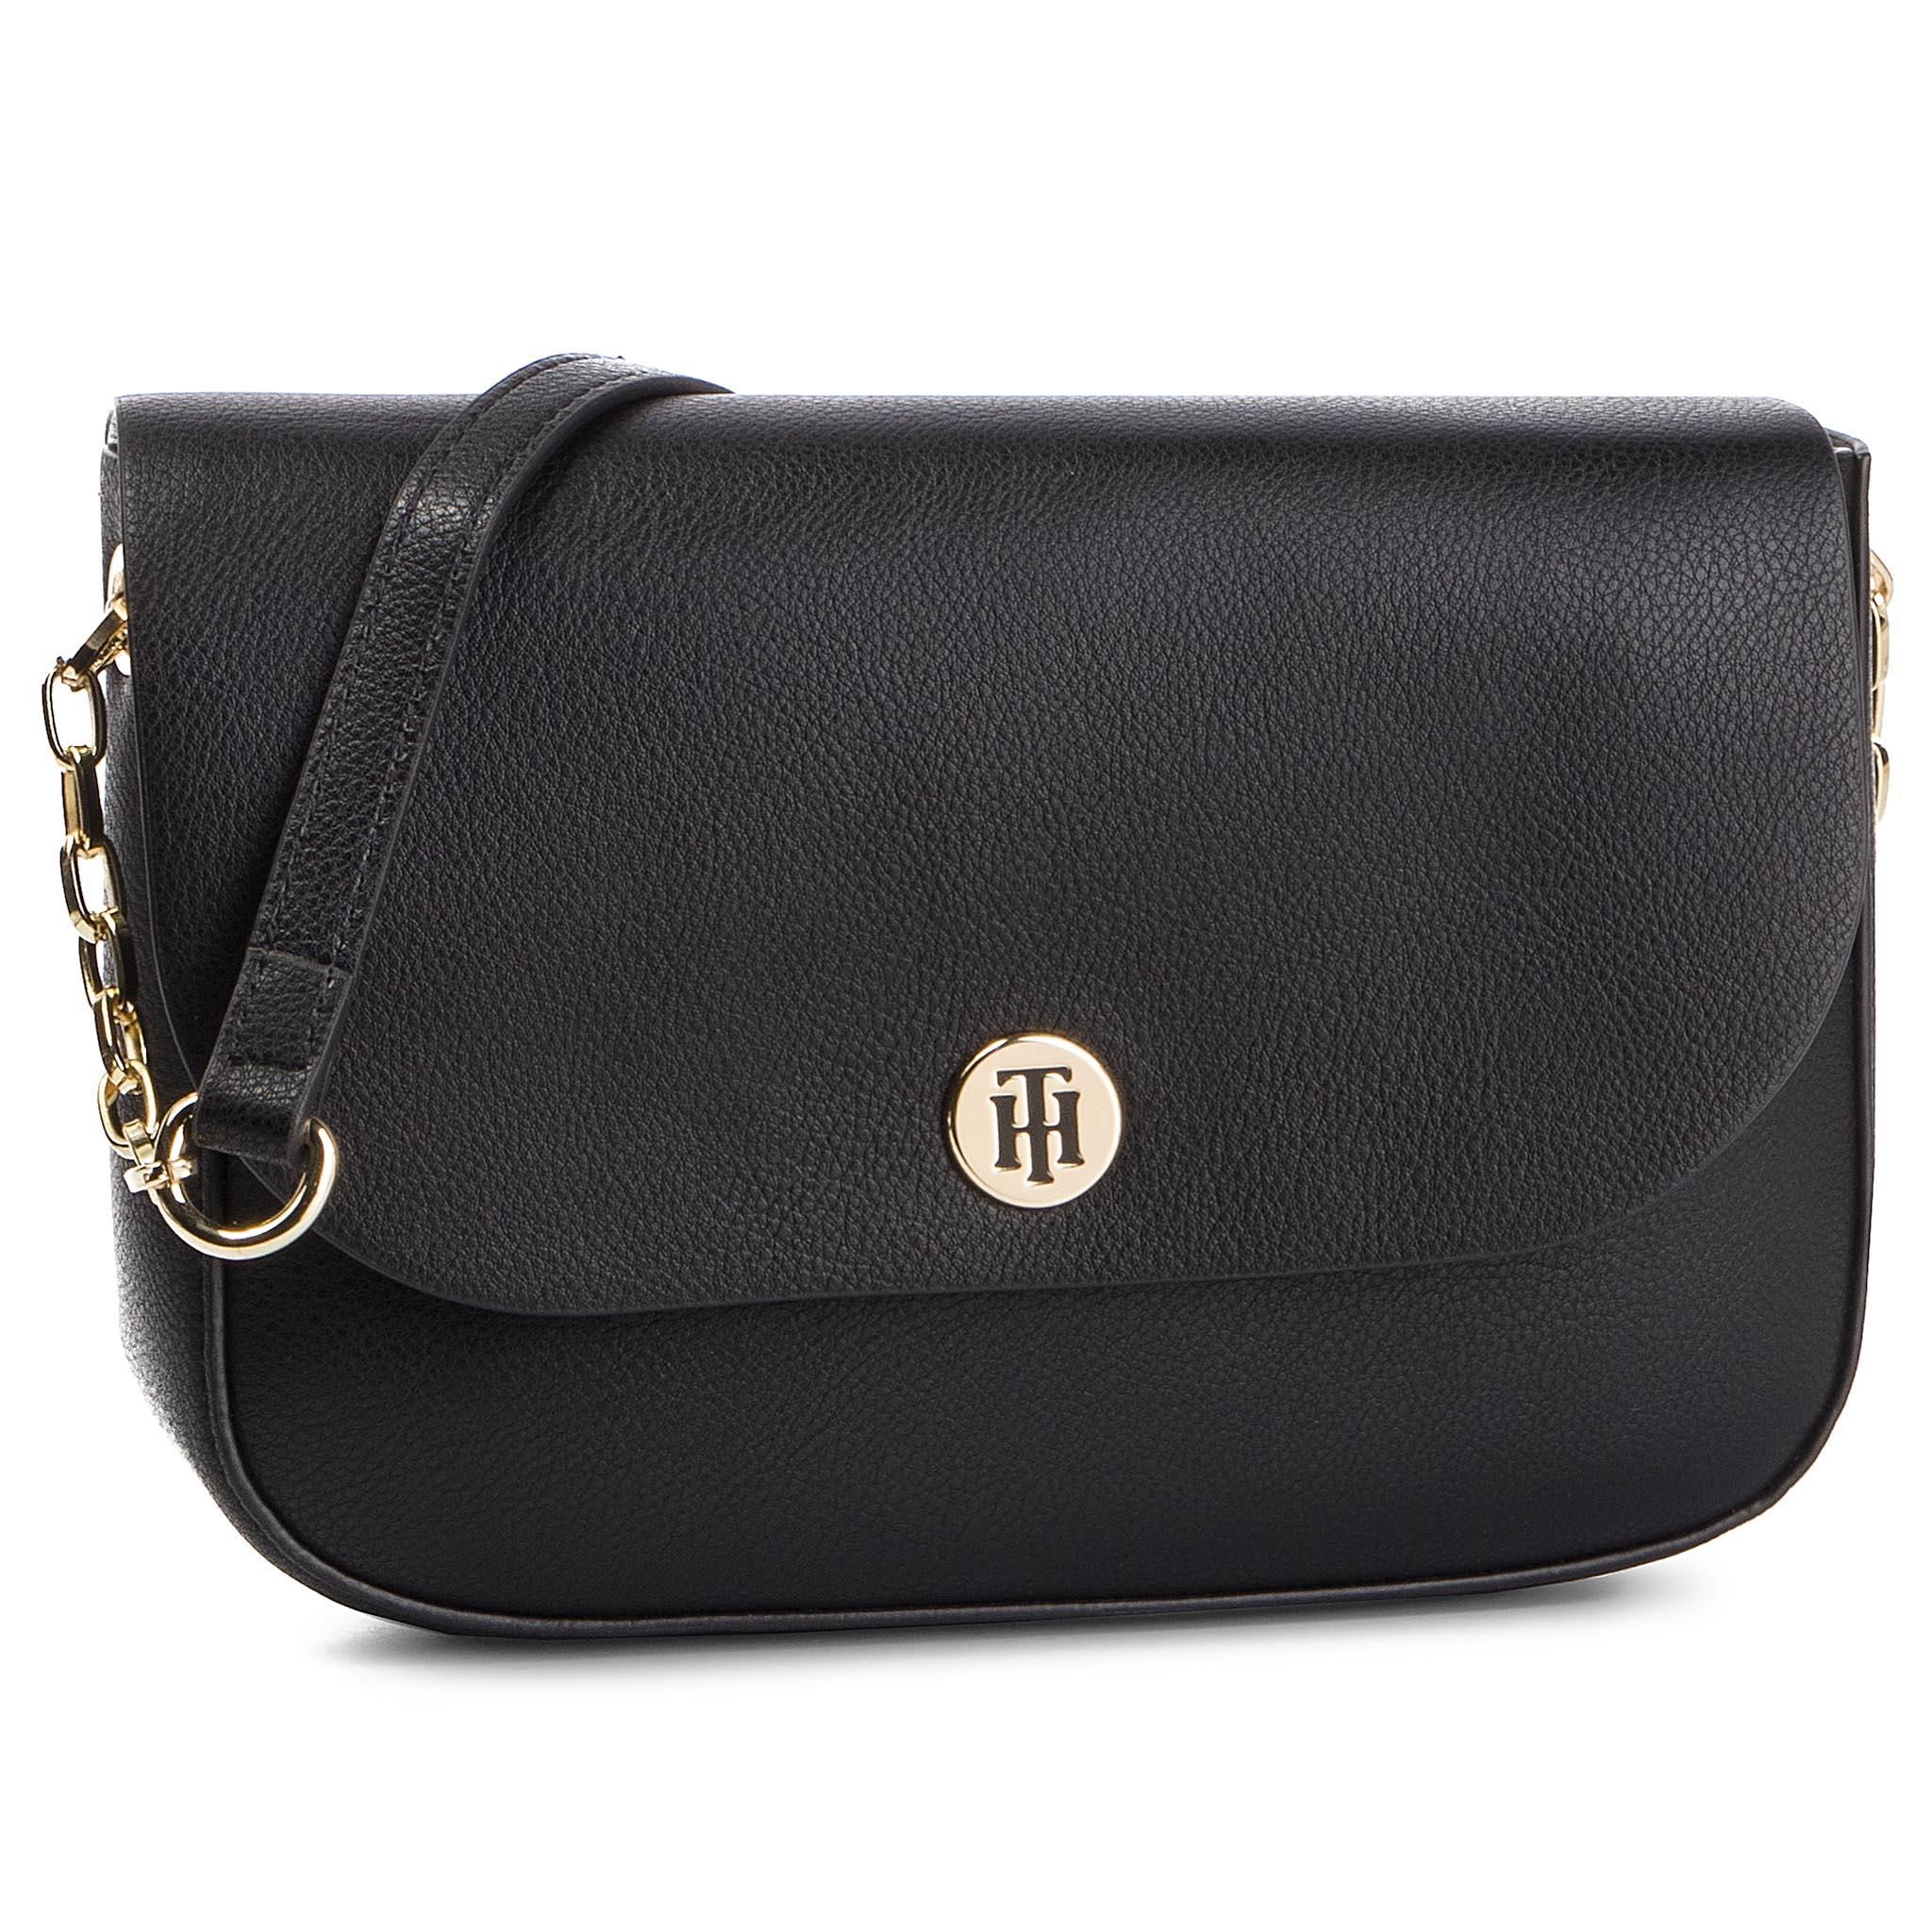 303aa3488f Handbag TOMMY HILFIGER - Honey Finegrain Crossover AW0AW06630 002 ...